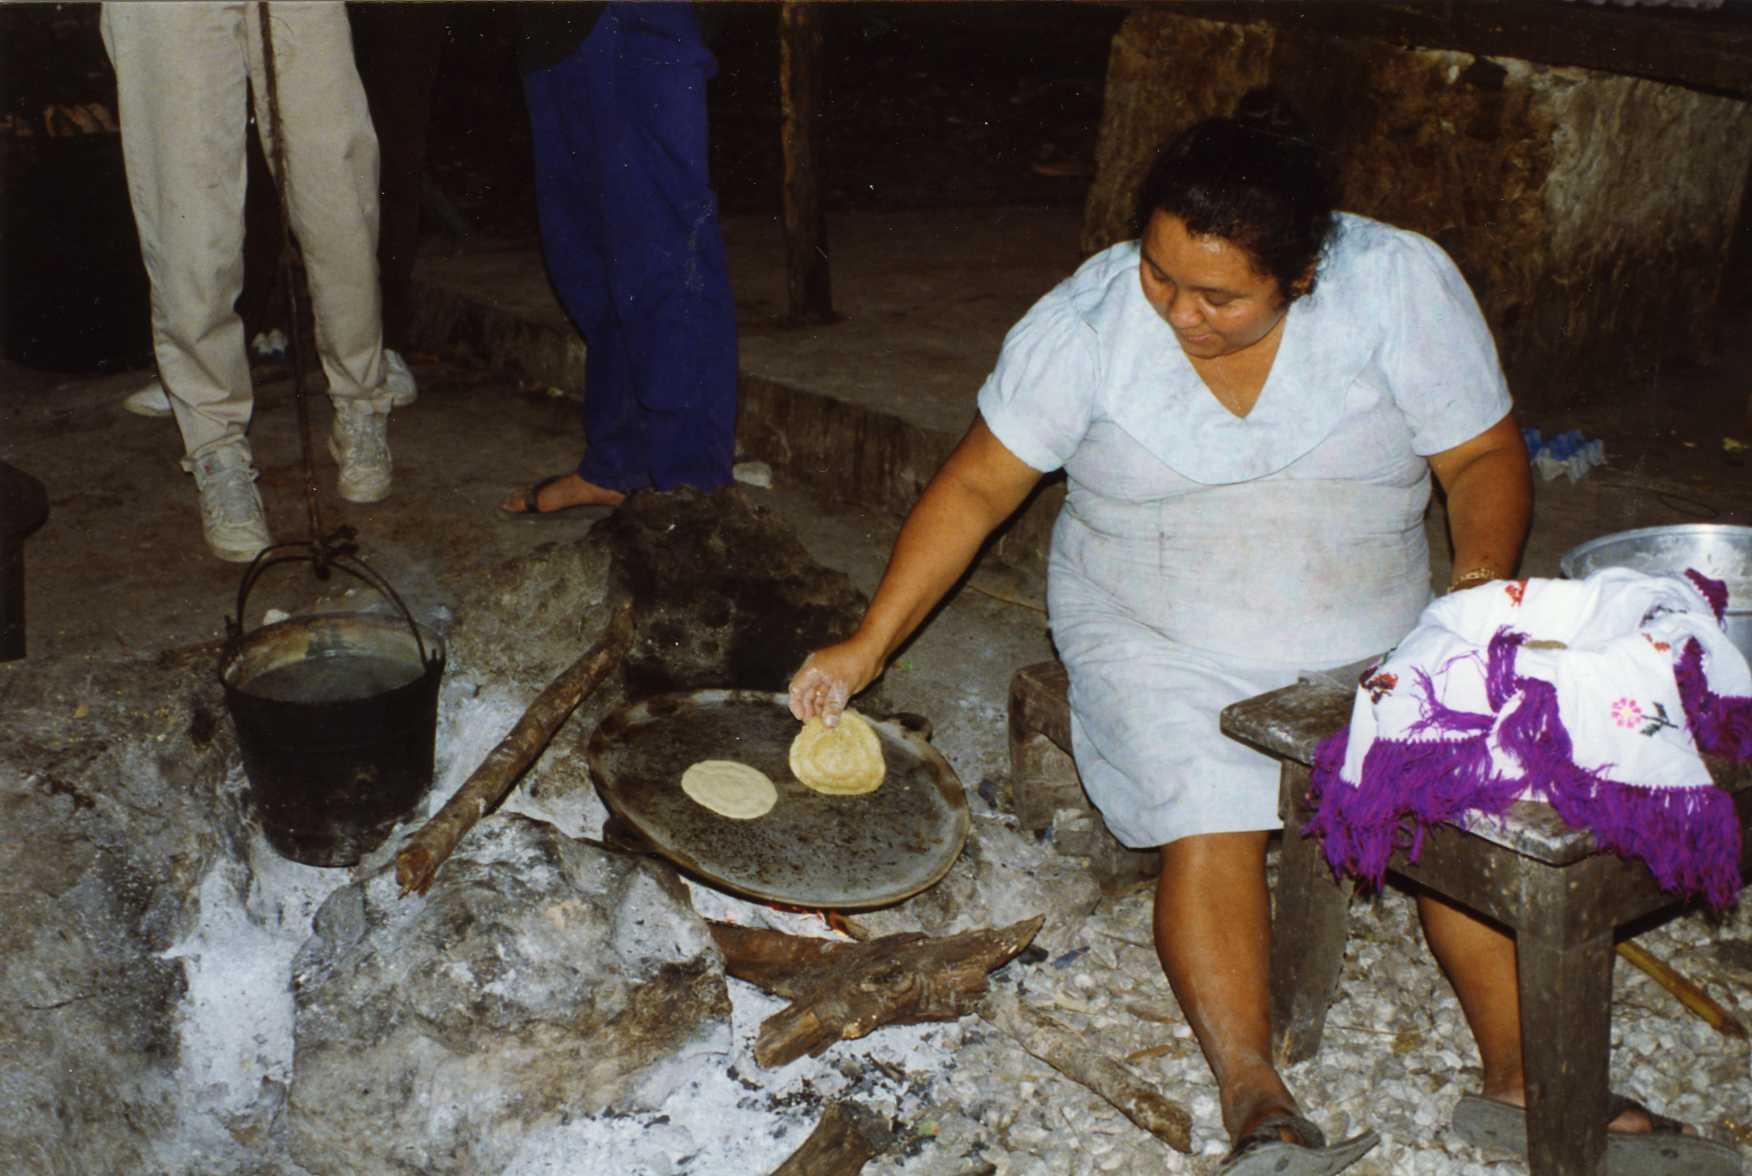 Making tortillas in the backyard, Tulum, Mexico